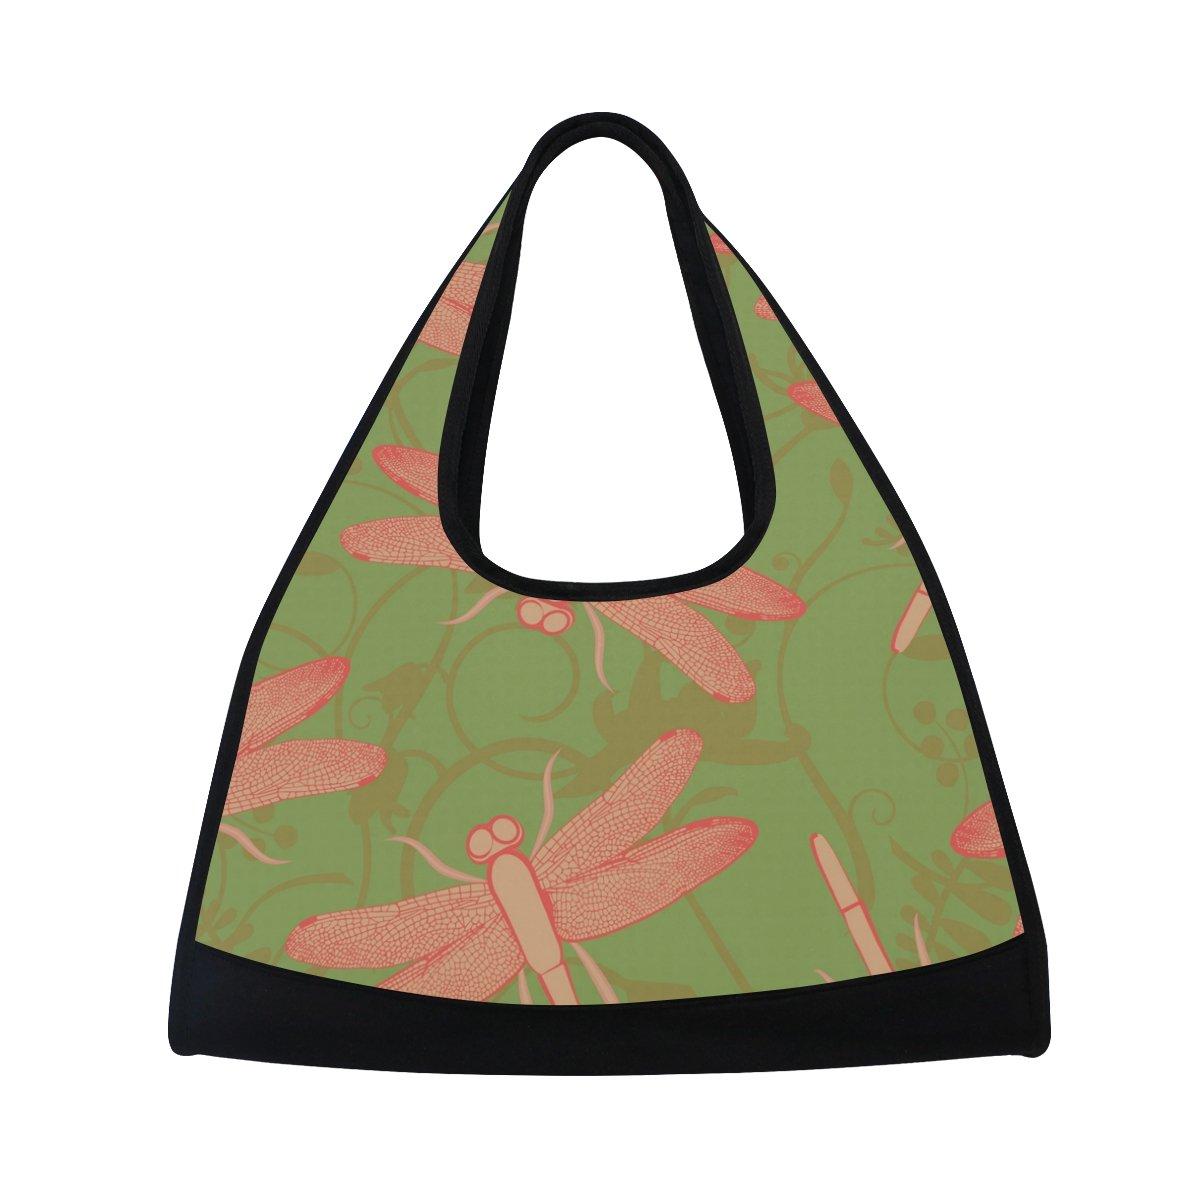 MAPOLO Dragonfly Summer Travel Duffel Bag Sports Gym Bag Shoulder Bag